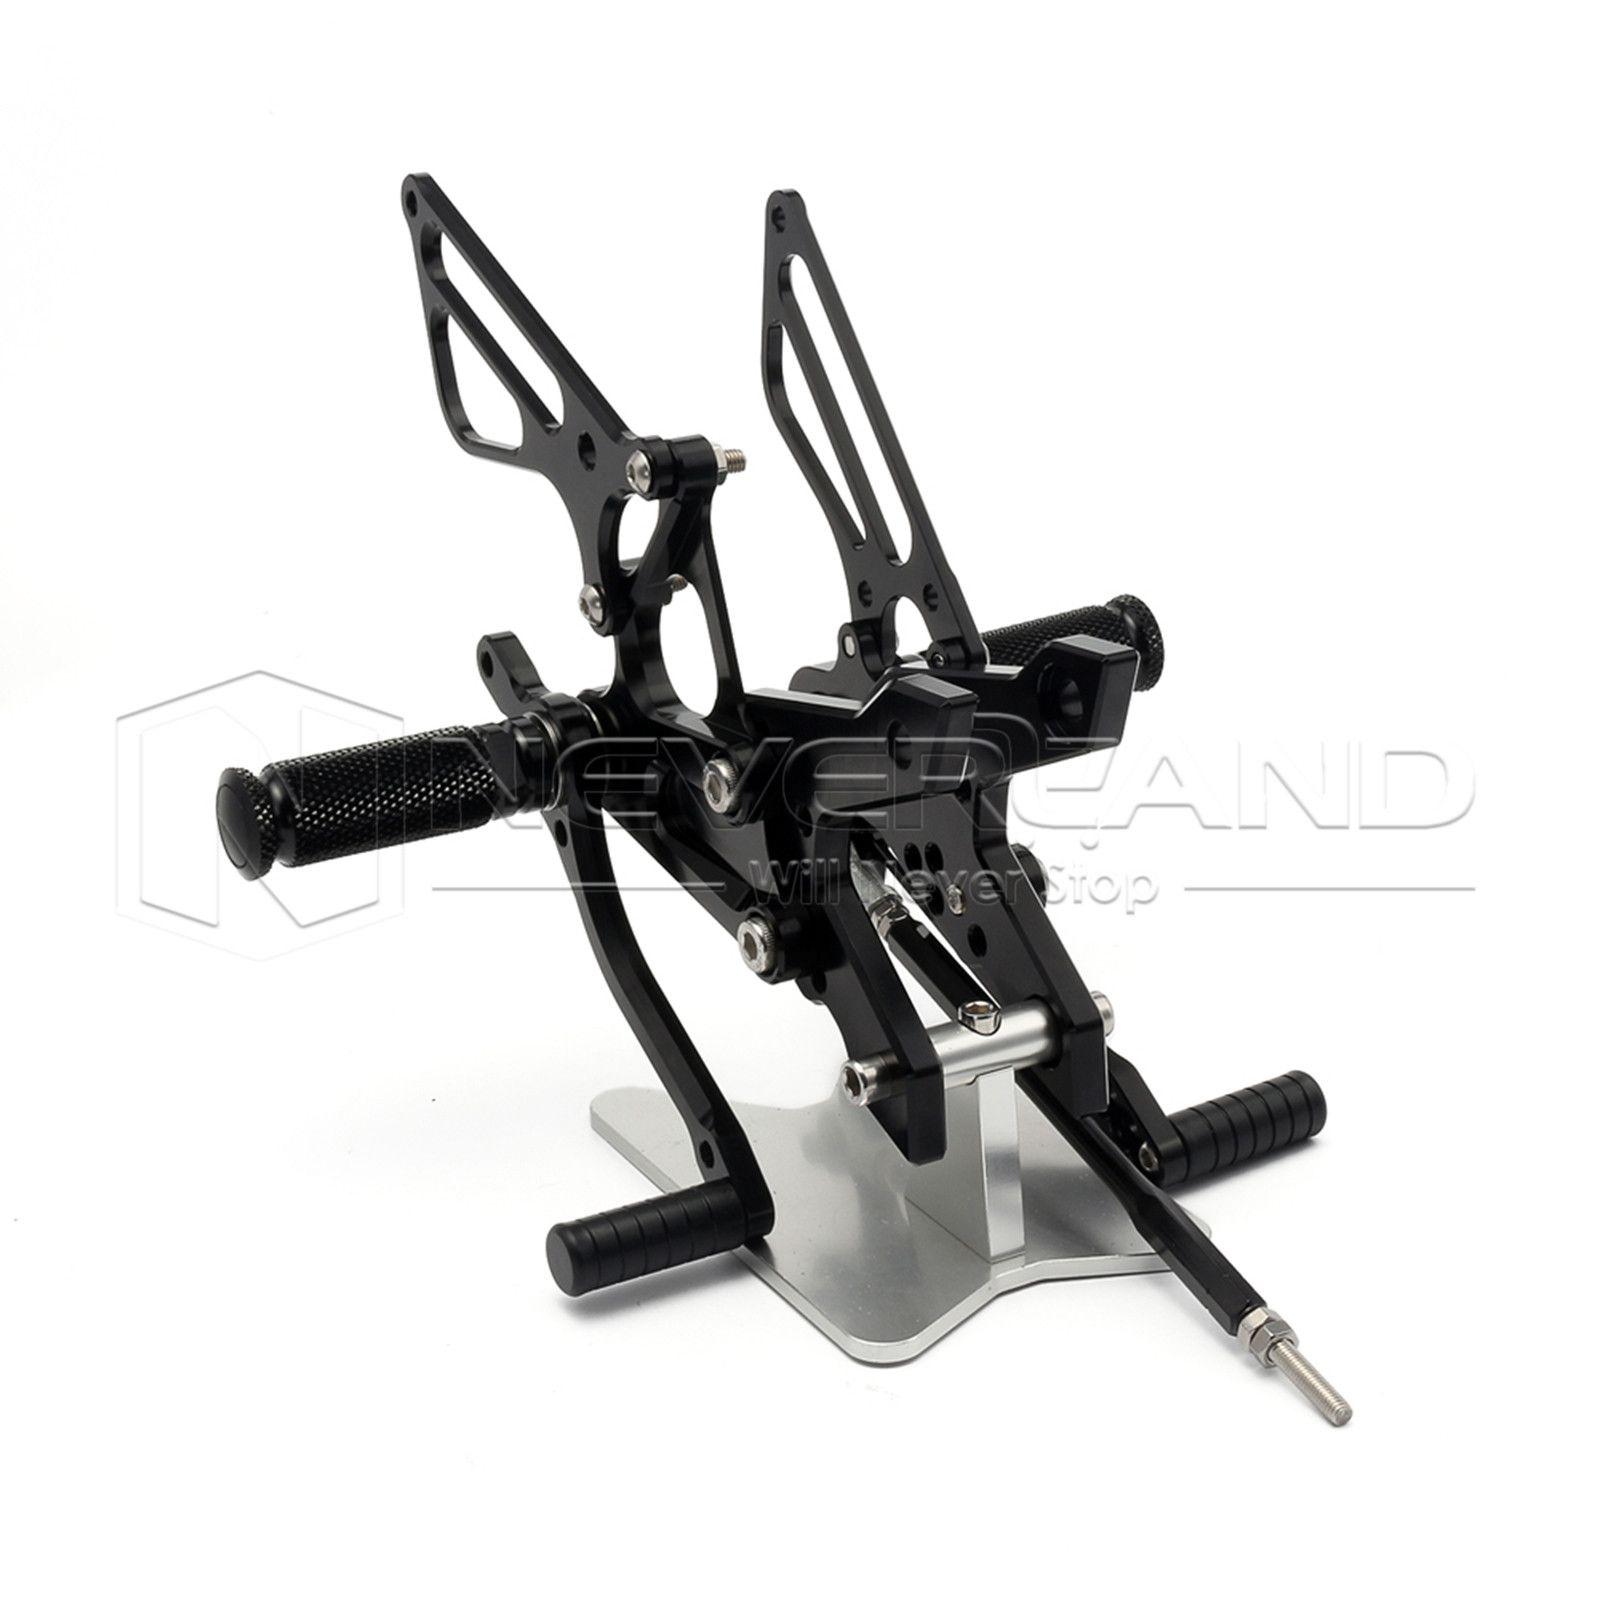 Adjustable Aluminum Alloy CNC Motorcycle Rear Set Foot Pegs For KAWASAKI Z750 07-13 Z1000 07-10 Black Silver Foot Rests D25